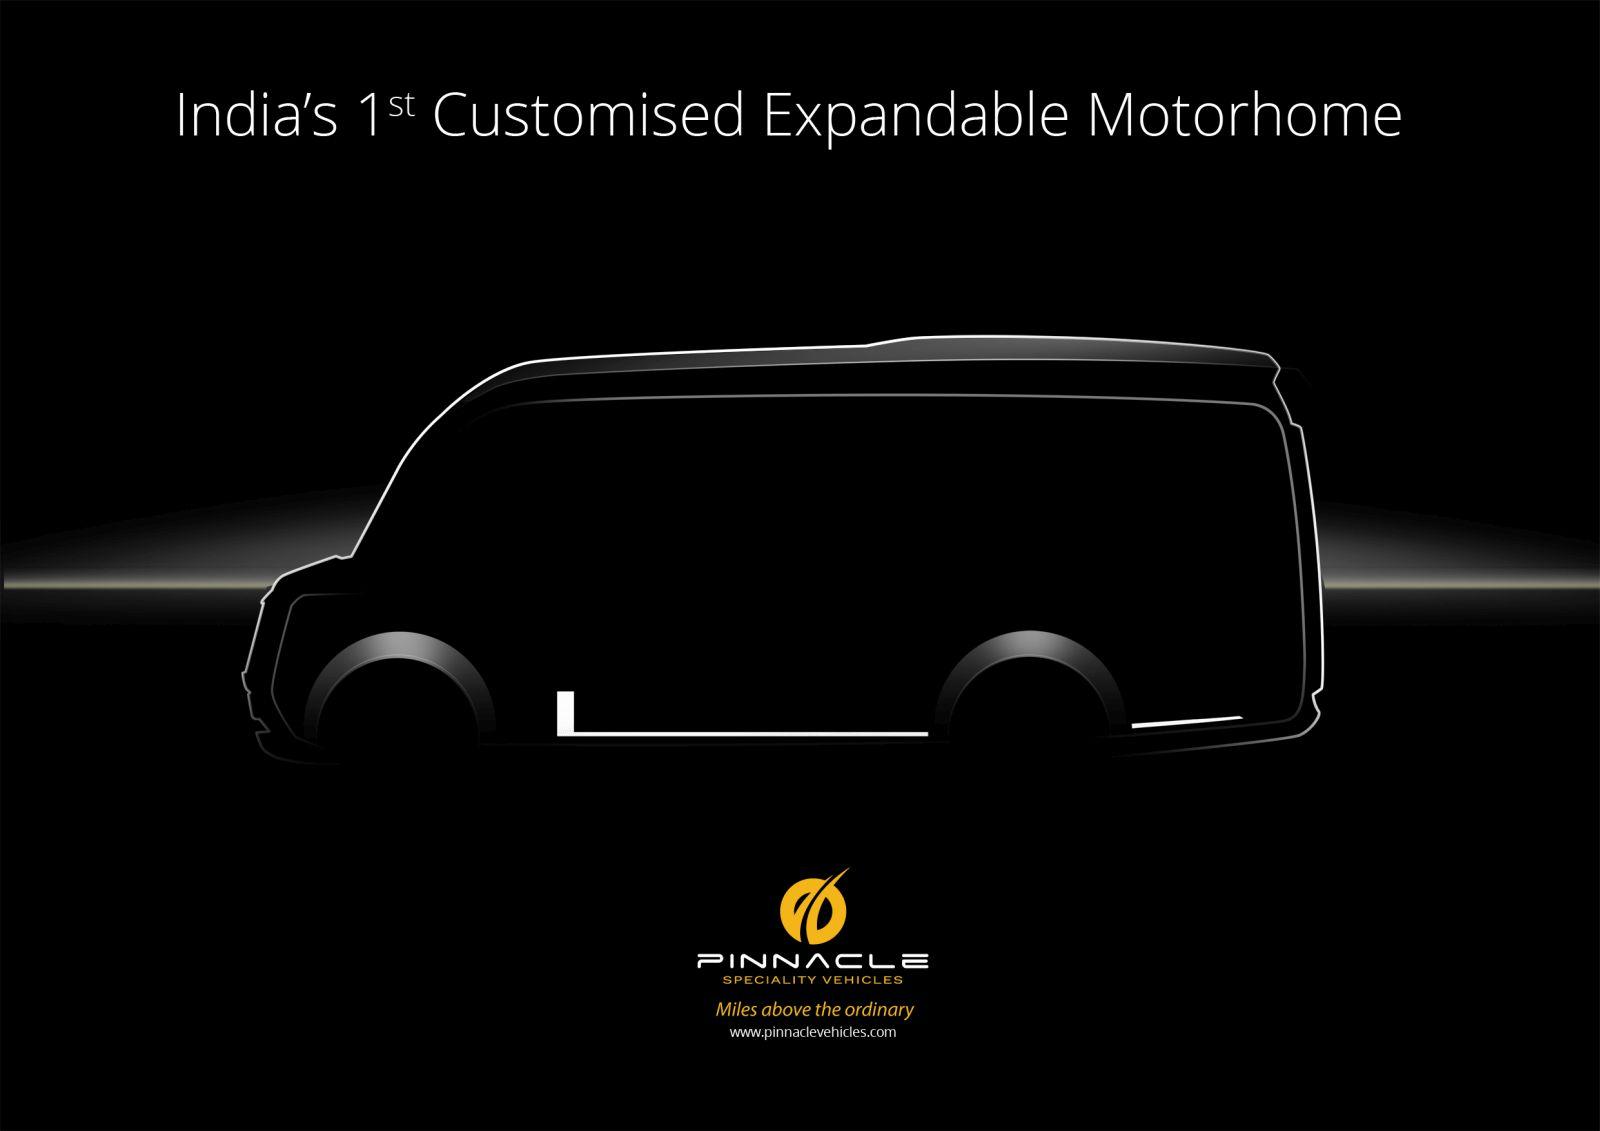 531b2de68c3d10 Auto Expo 2018   Pinnacle Speciality Vehicle To Unveil  Finetza